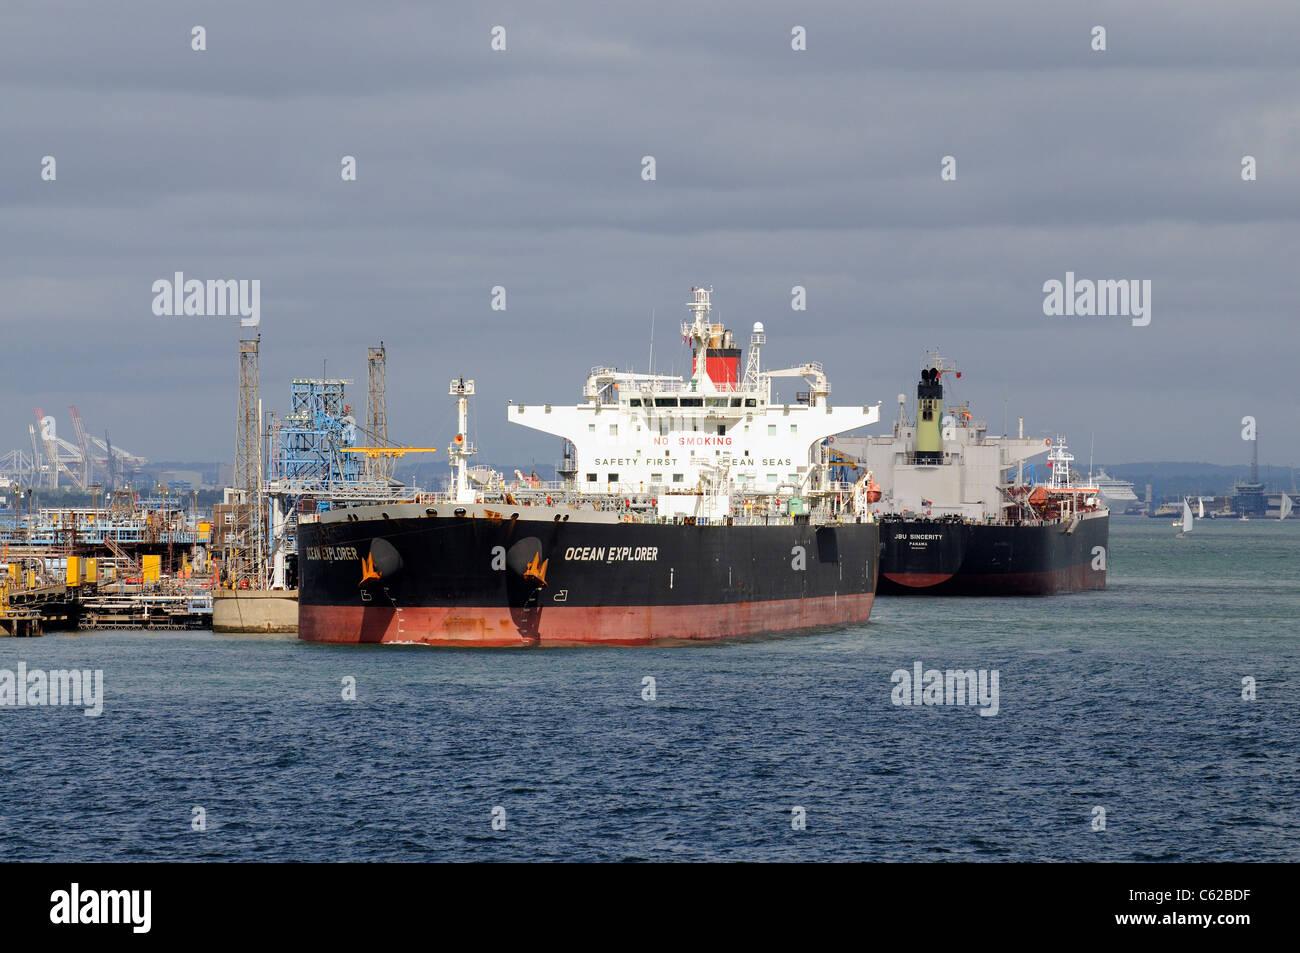 Bulk tanker ship the Ocean Explorer & JBU Sincerity alongside Fawley refinery on Southampton Water southern - Stock Image